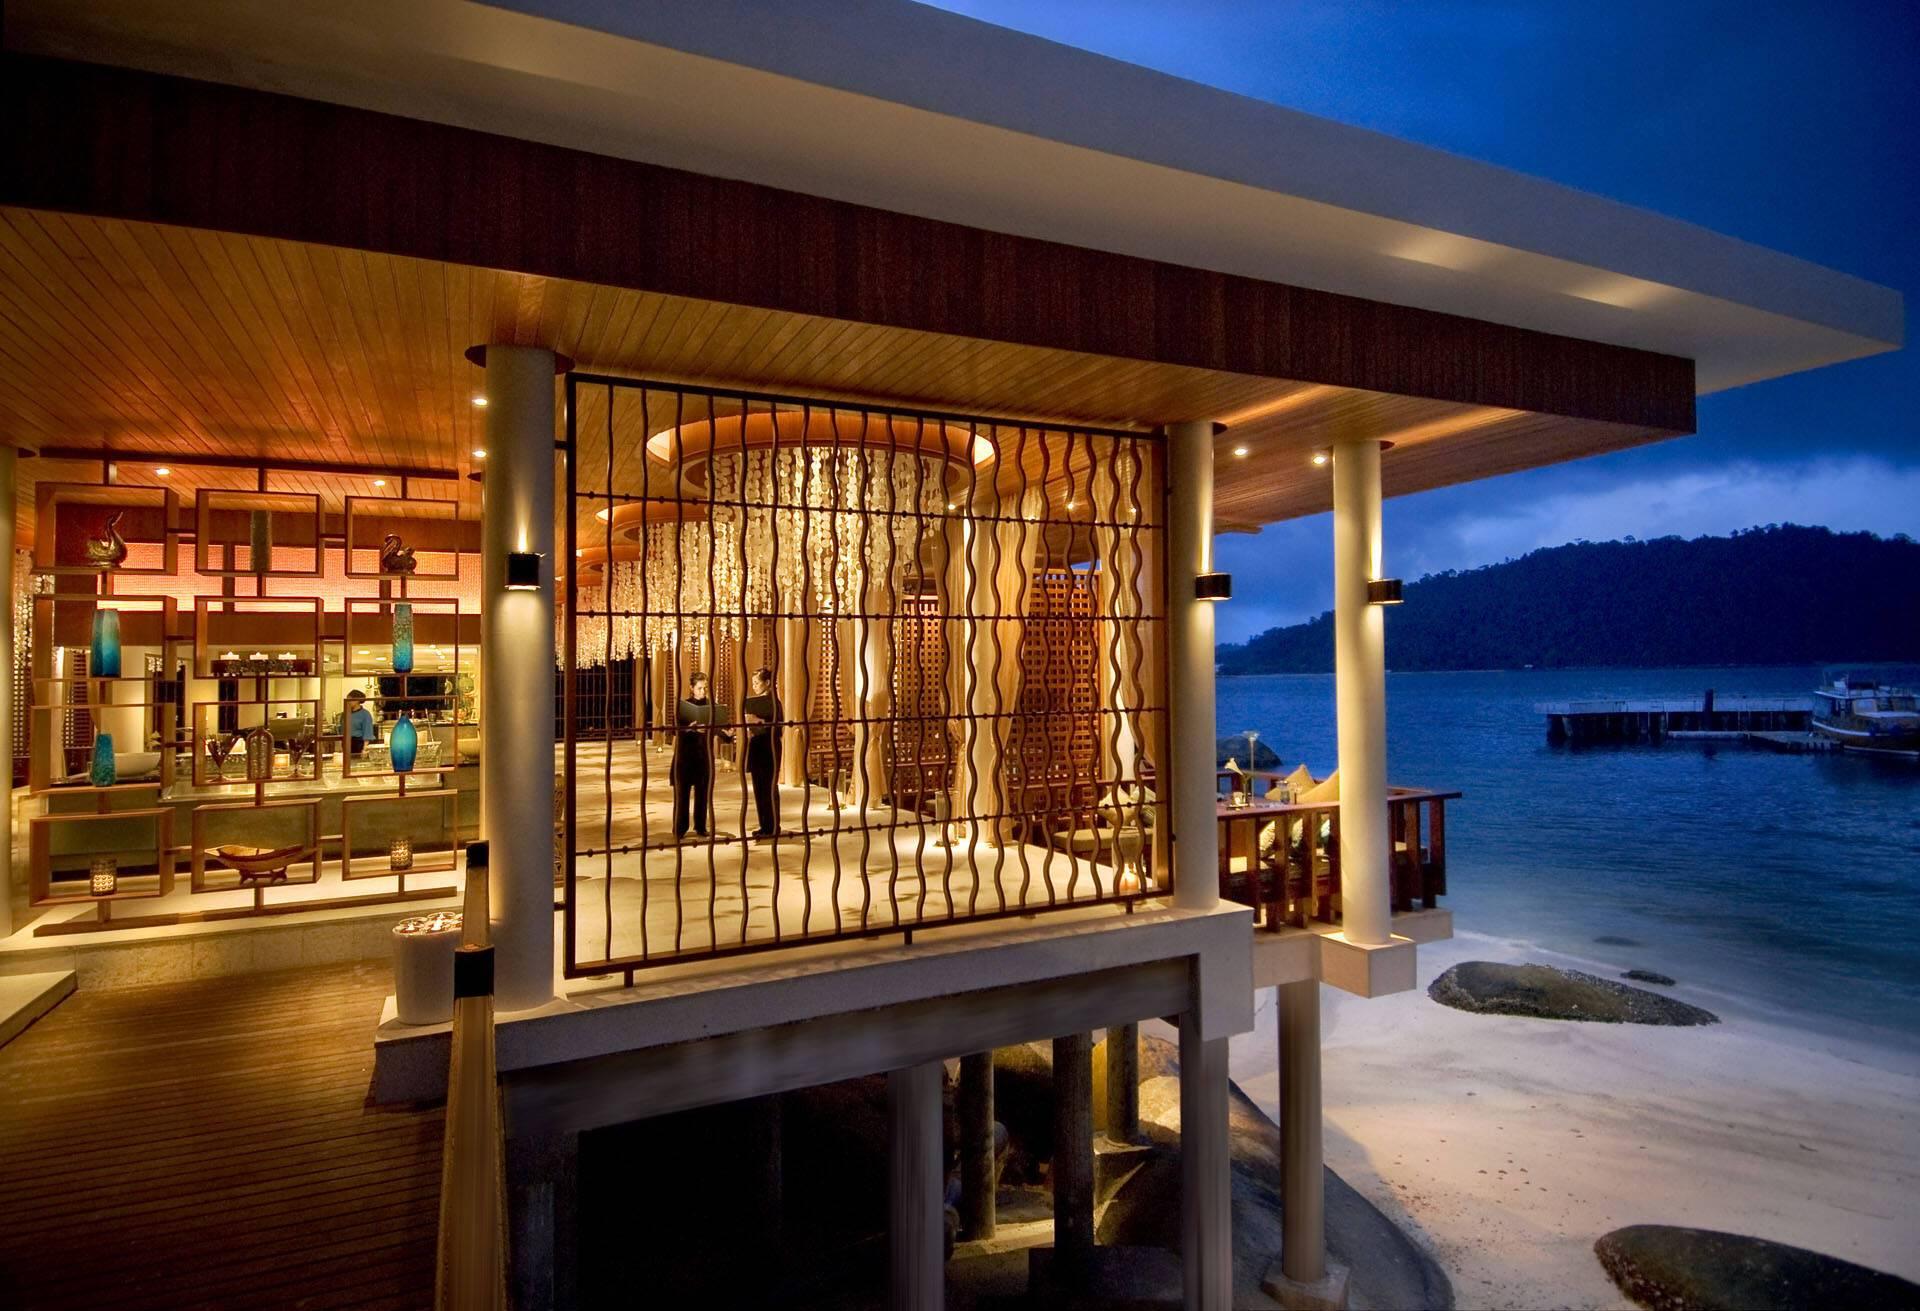 Pangkor Laut Resort Malaisie The Straits